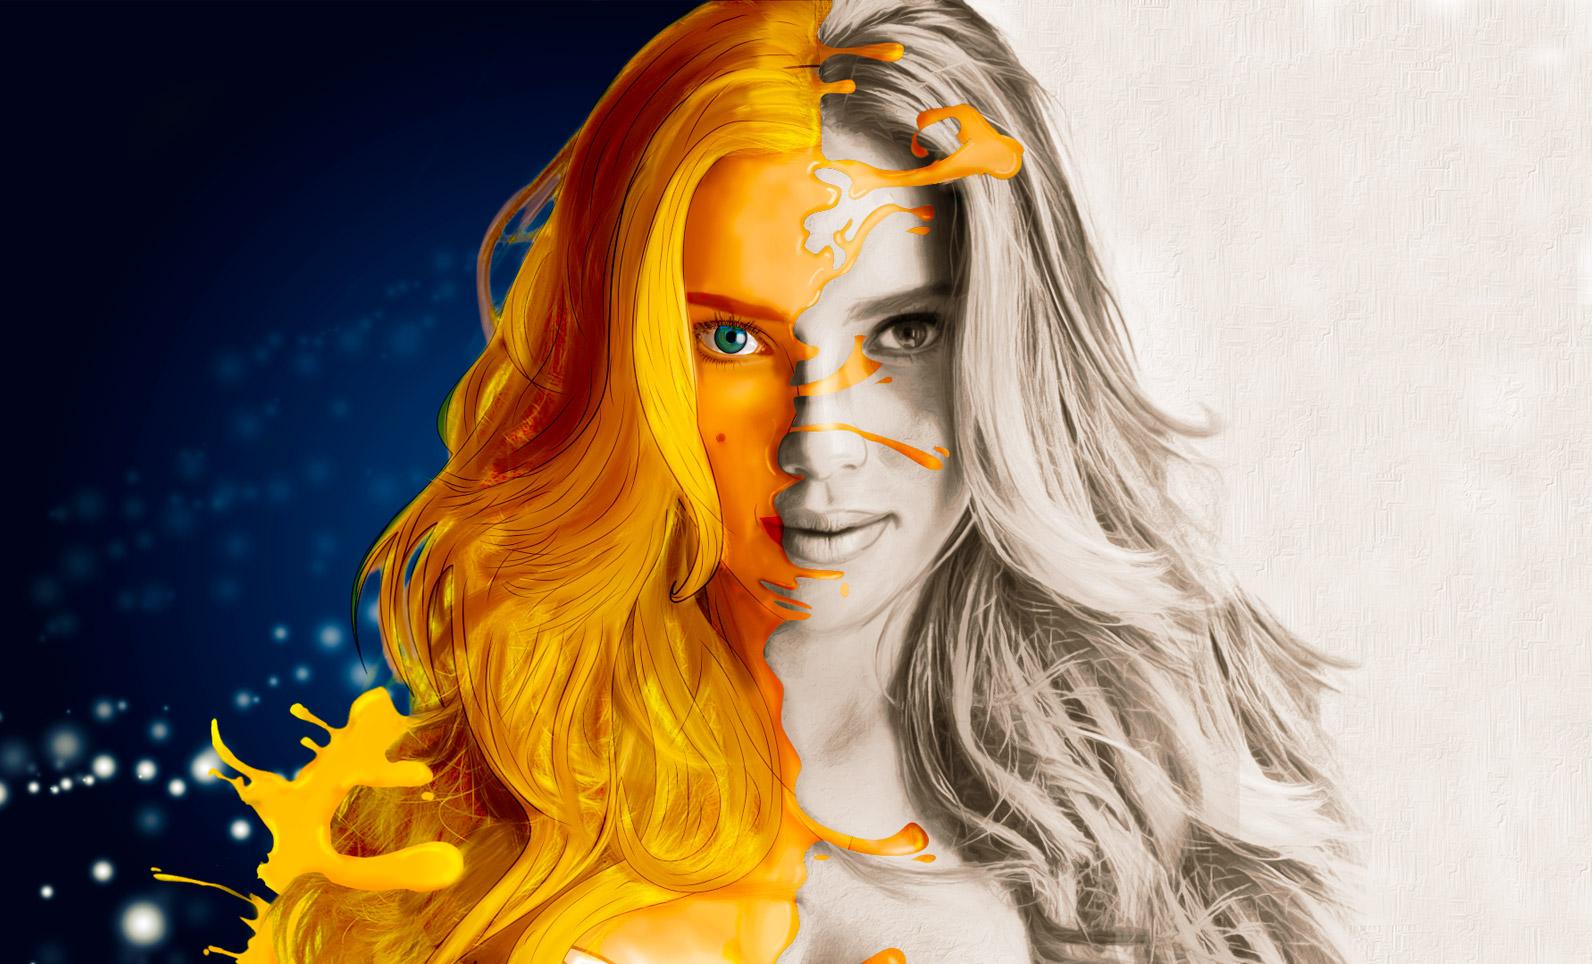 Pintura digital- Scarlette Johansson